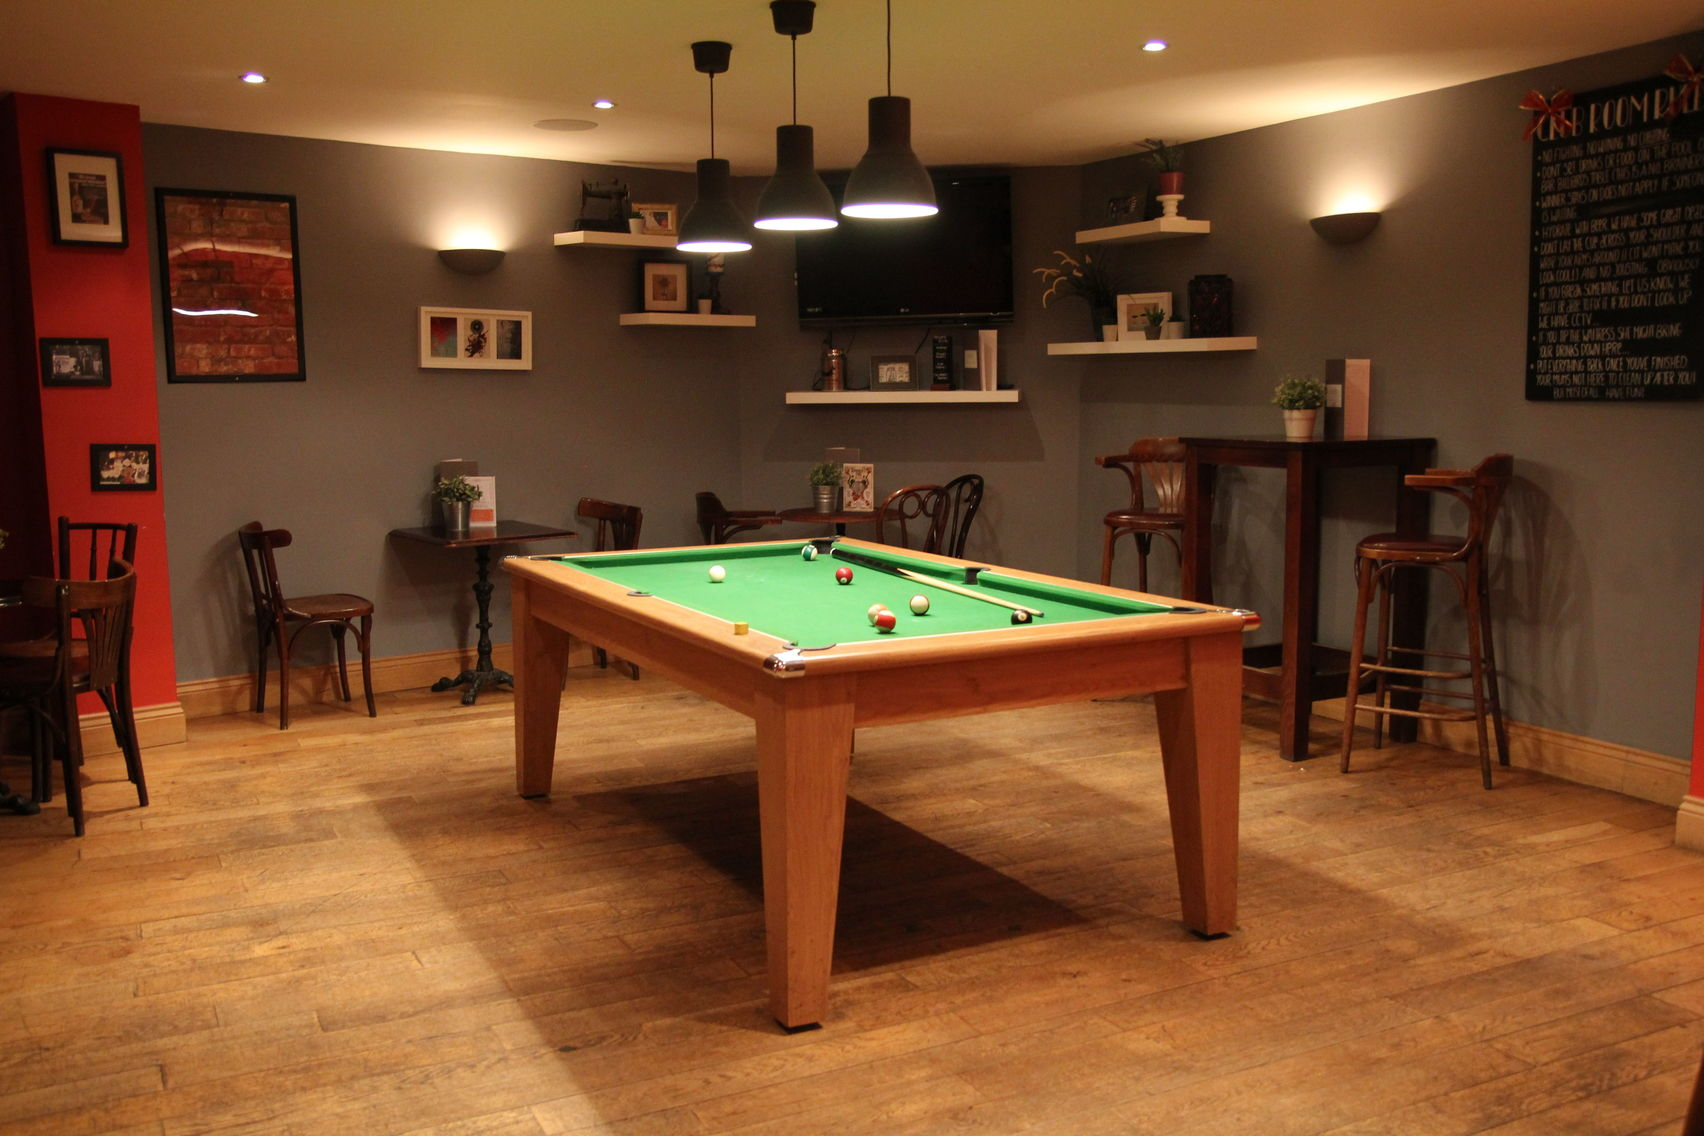 Ludgate Club Room, Jamies Wine Bar, Ludgate Hill.